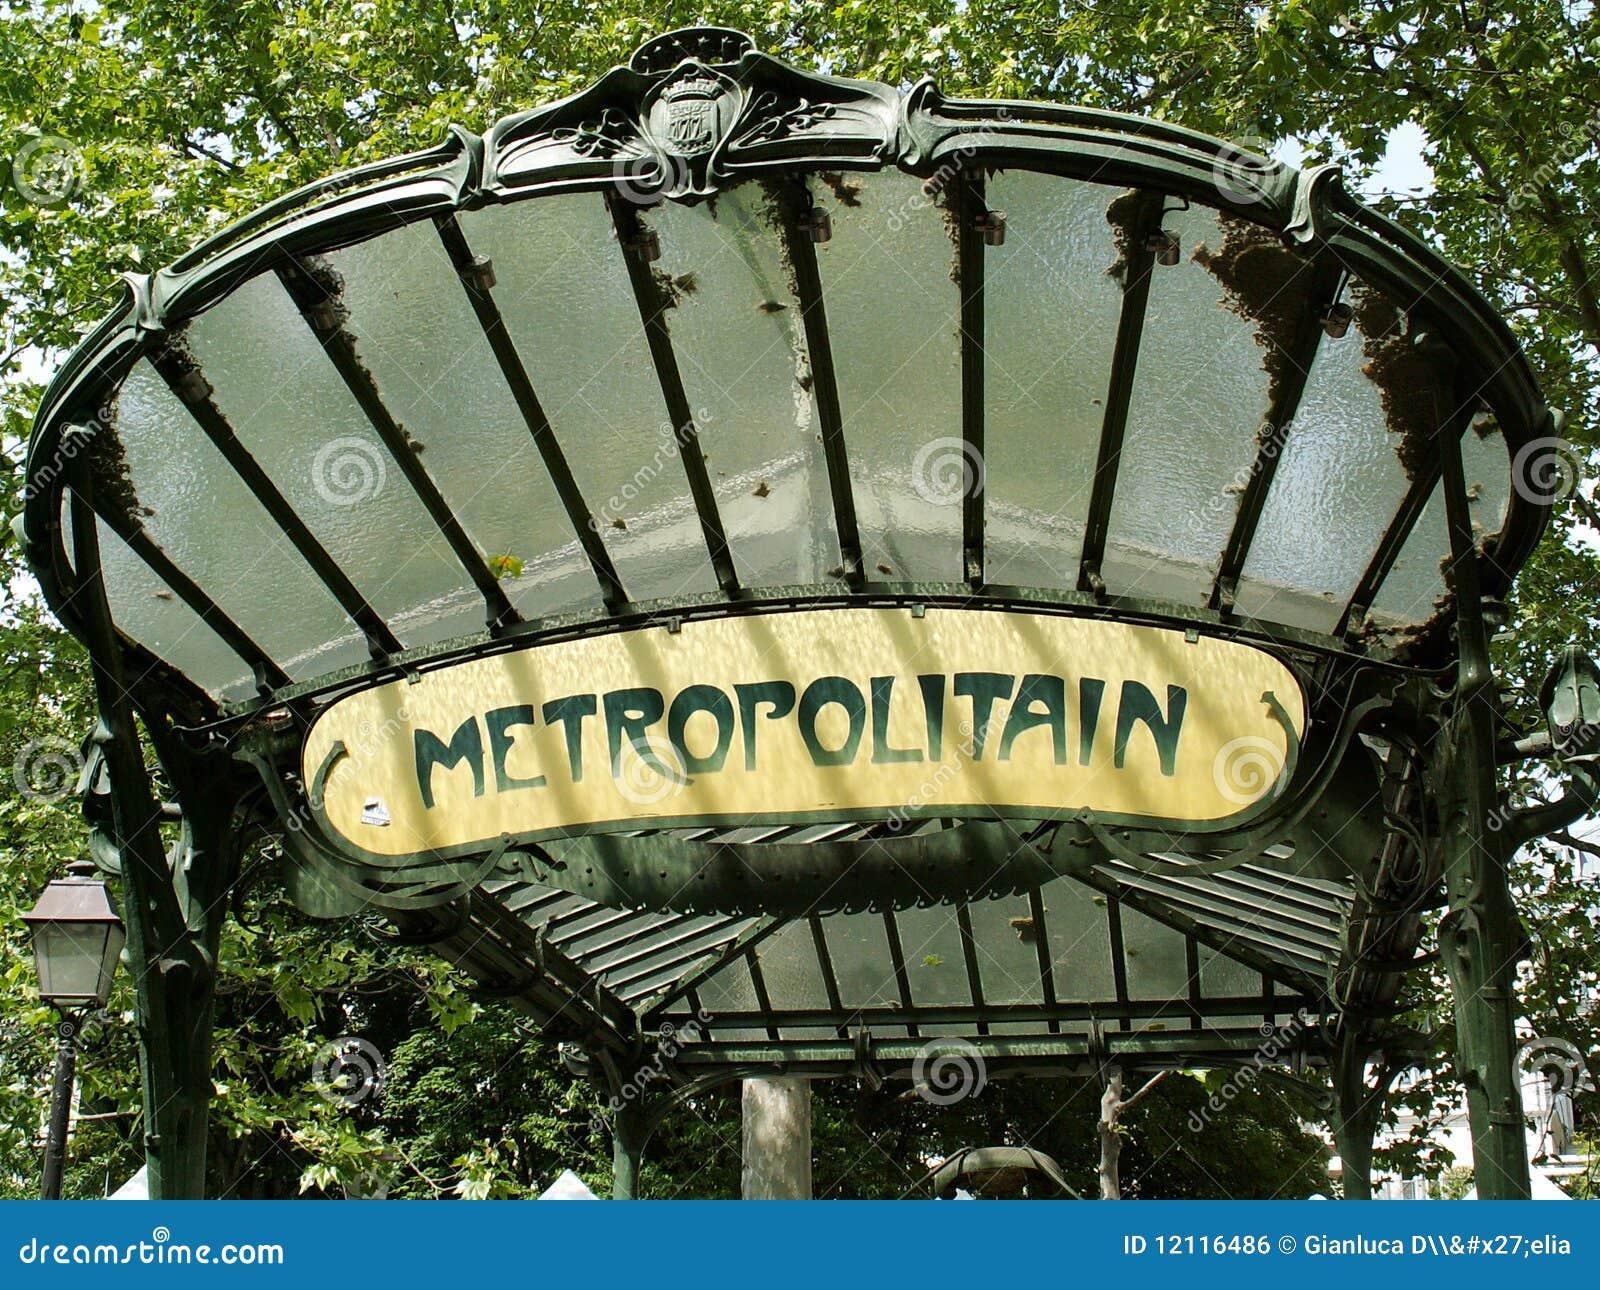 Gavra tegelgroothandel tegel metro parijs obas.us